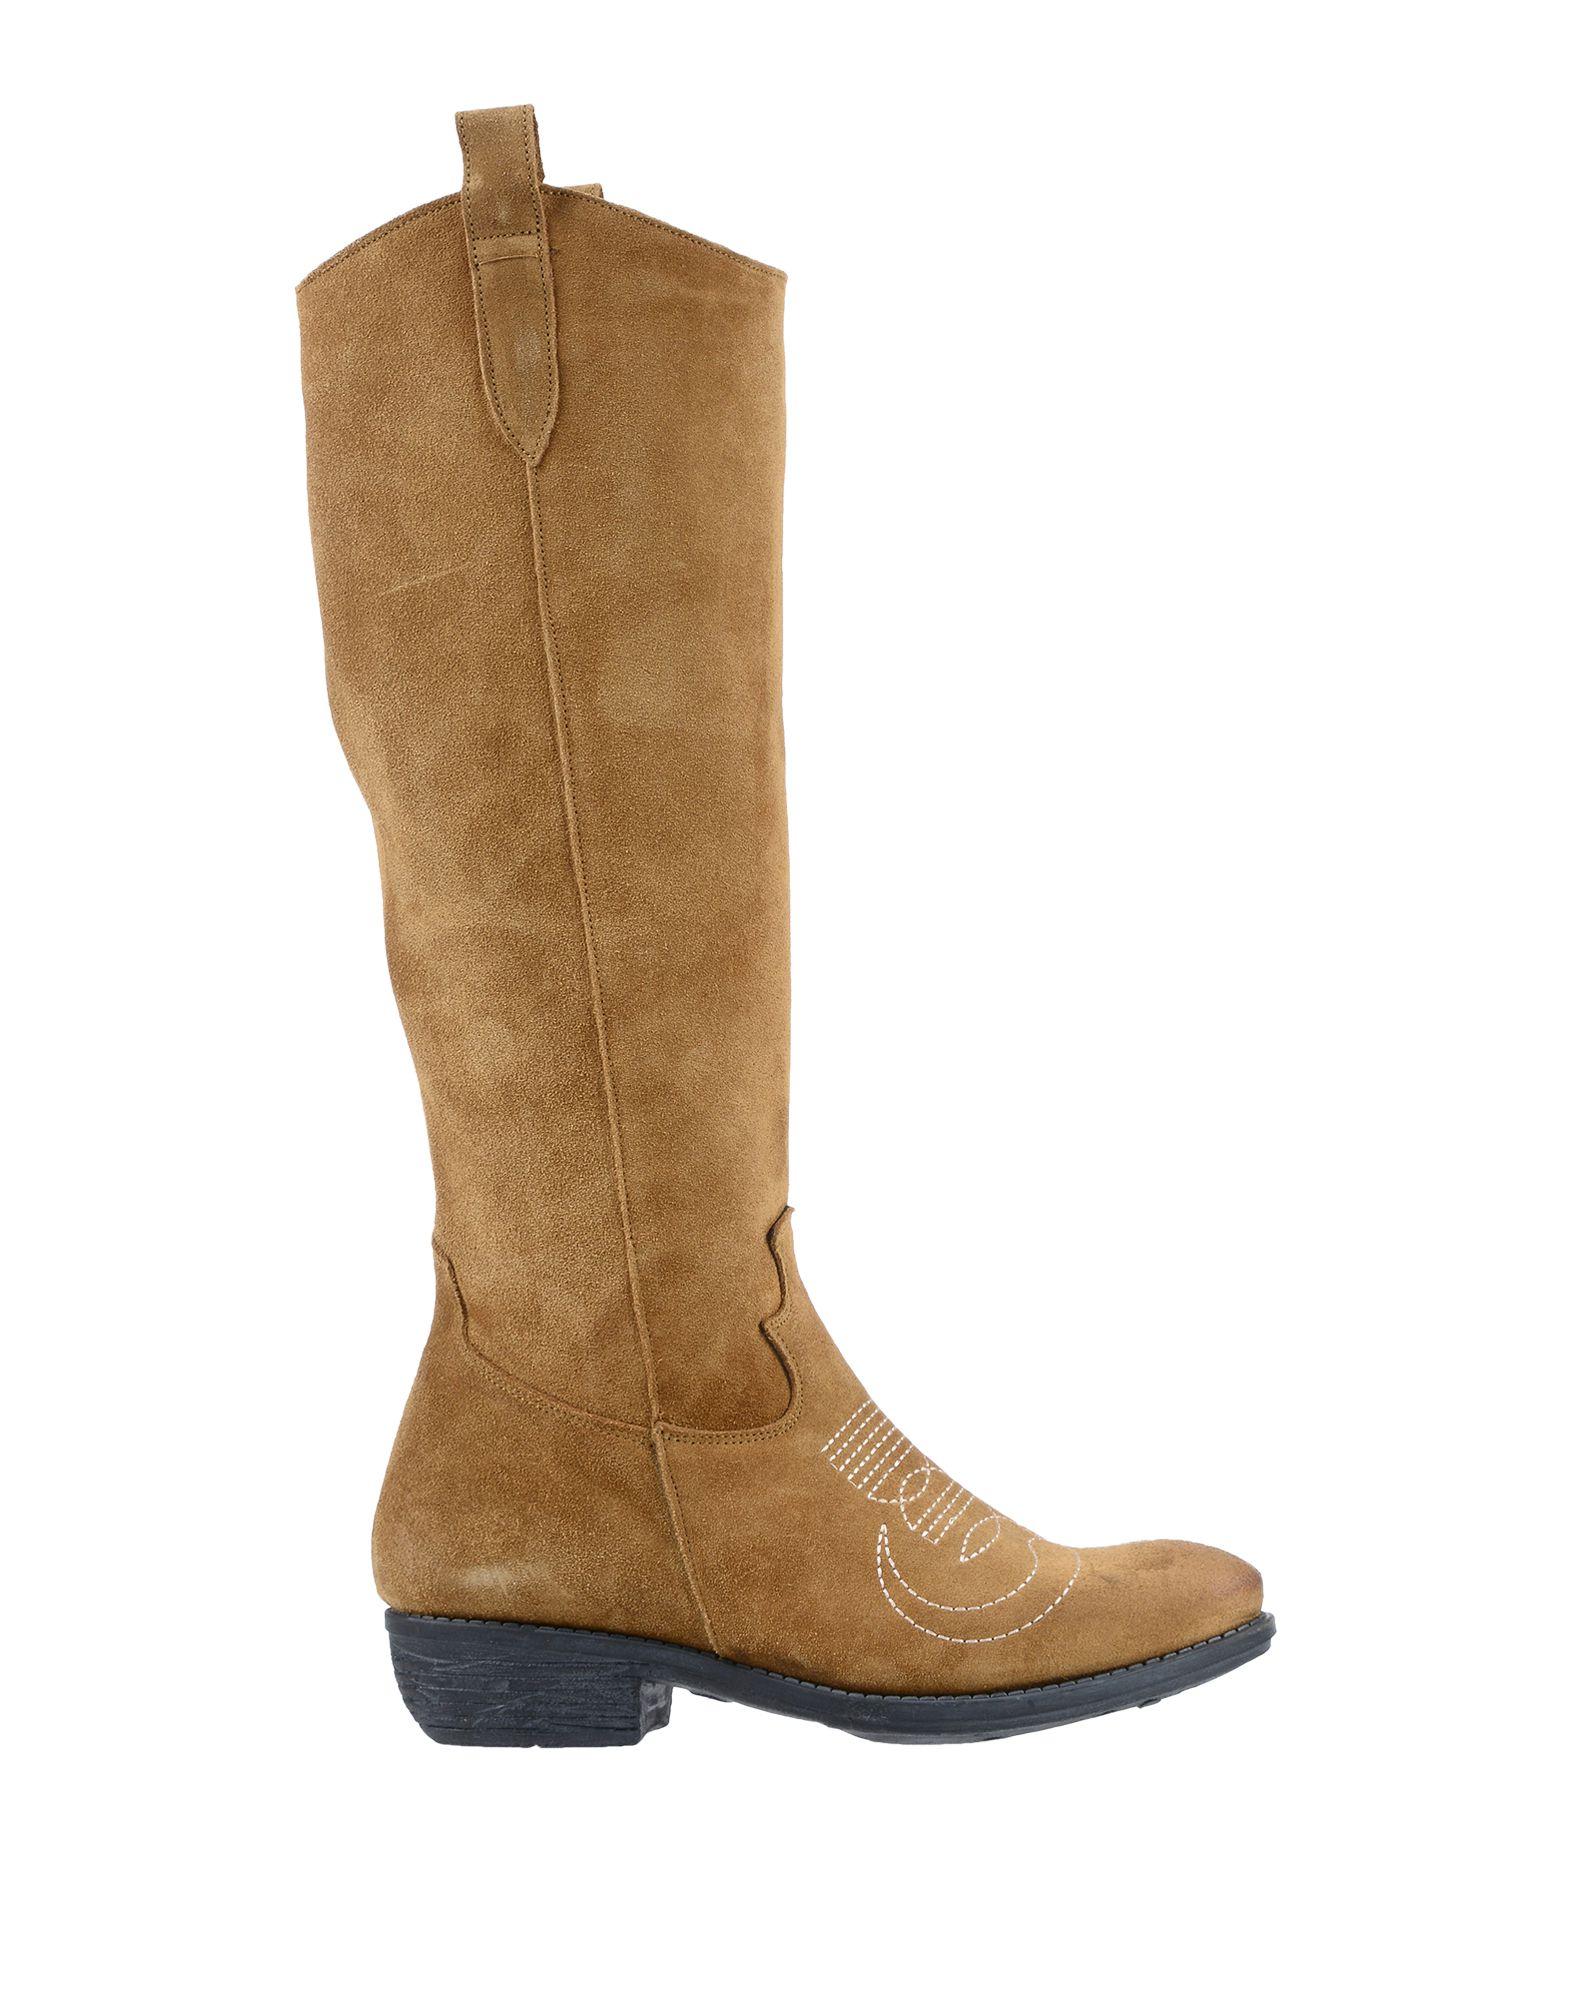 Stiefel Rock Rodeo damen - 11669791LS